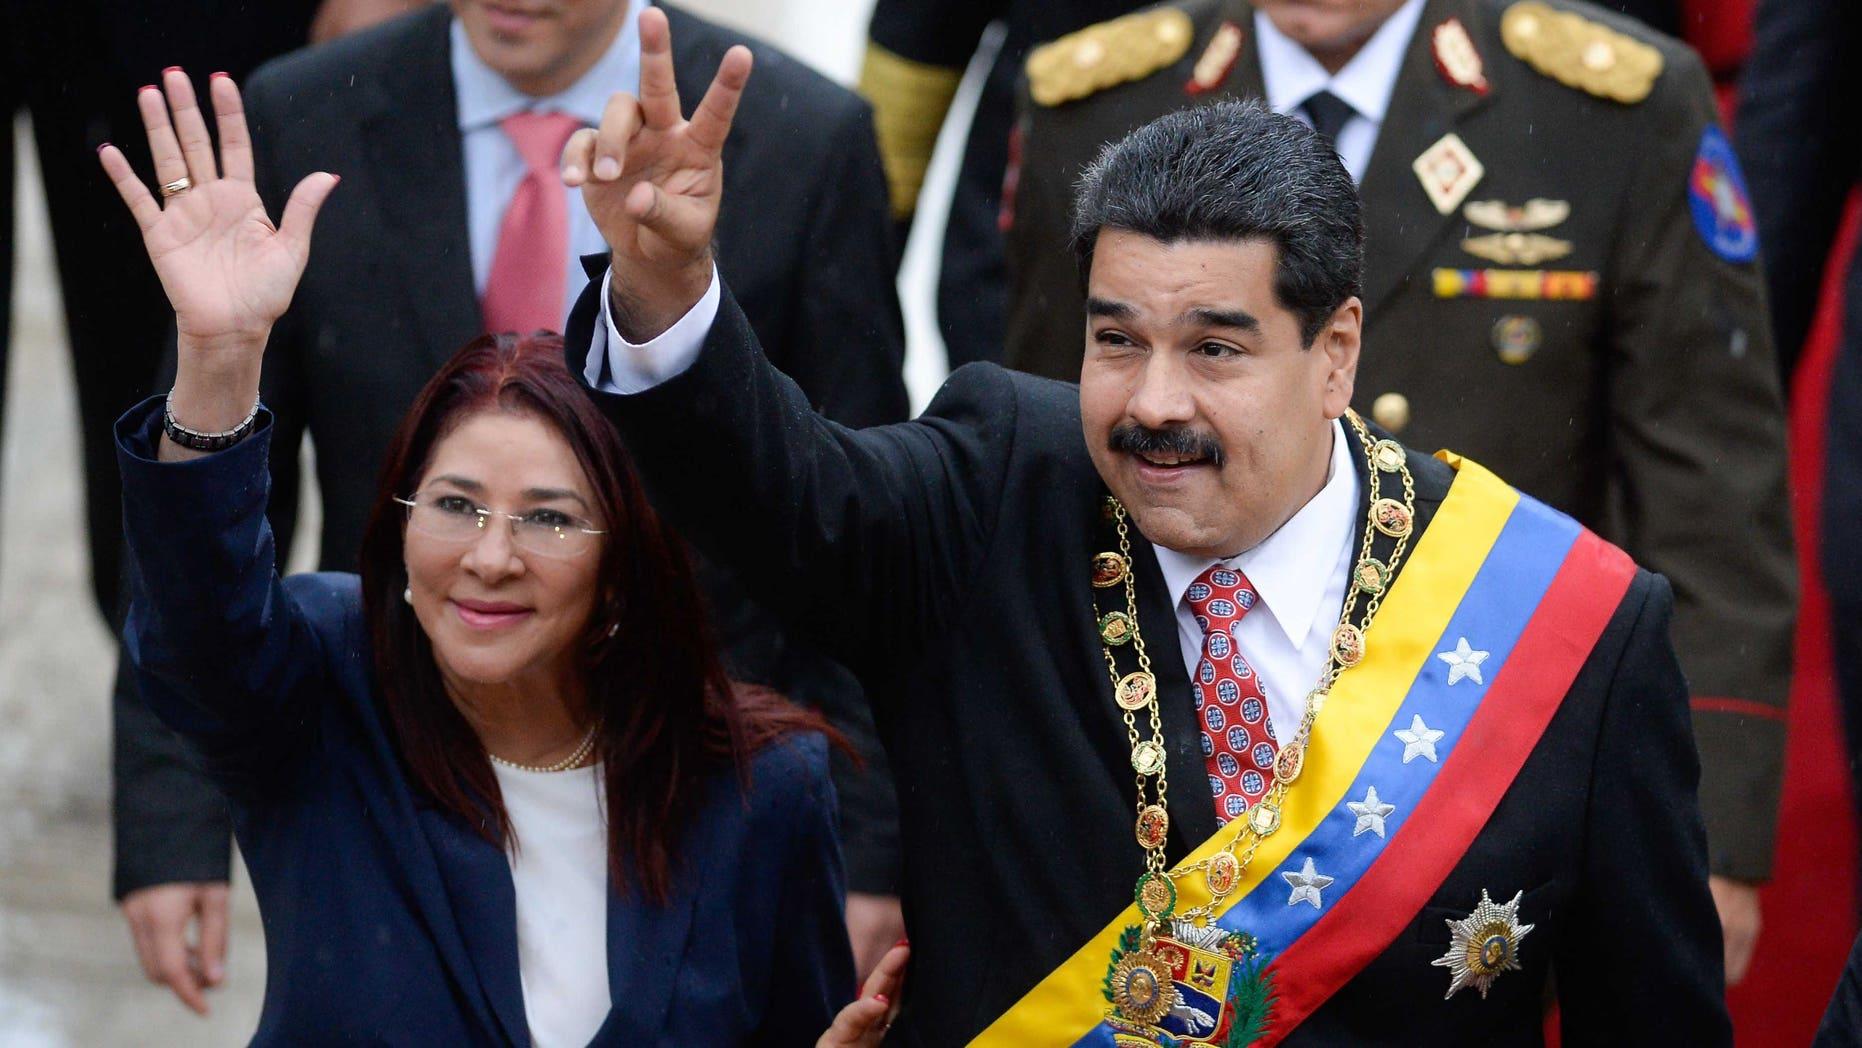 Venezuelan President Nicolas Maduro and his wife Cilia Flores on July 5, 2015.